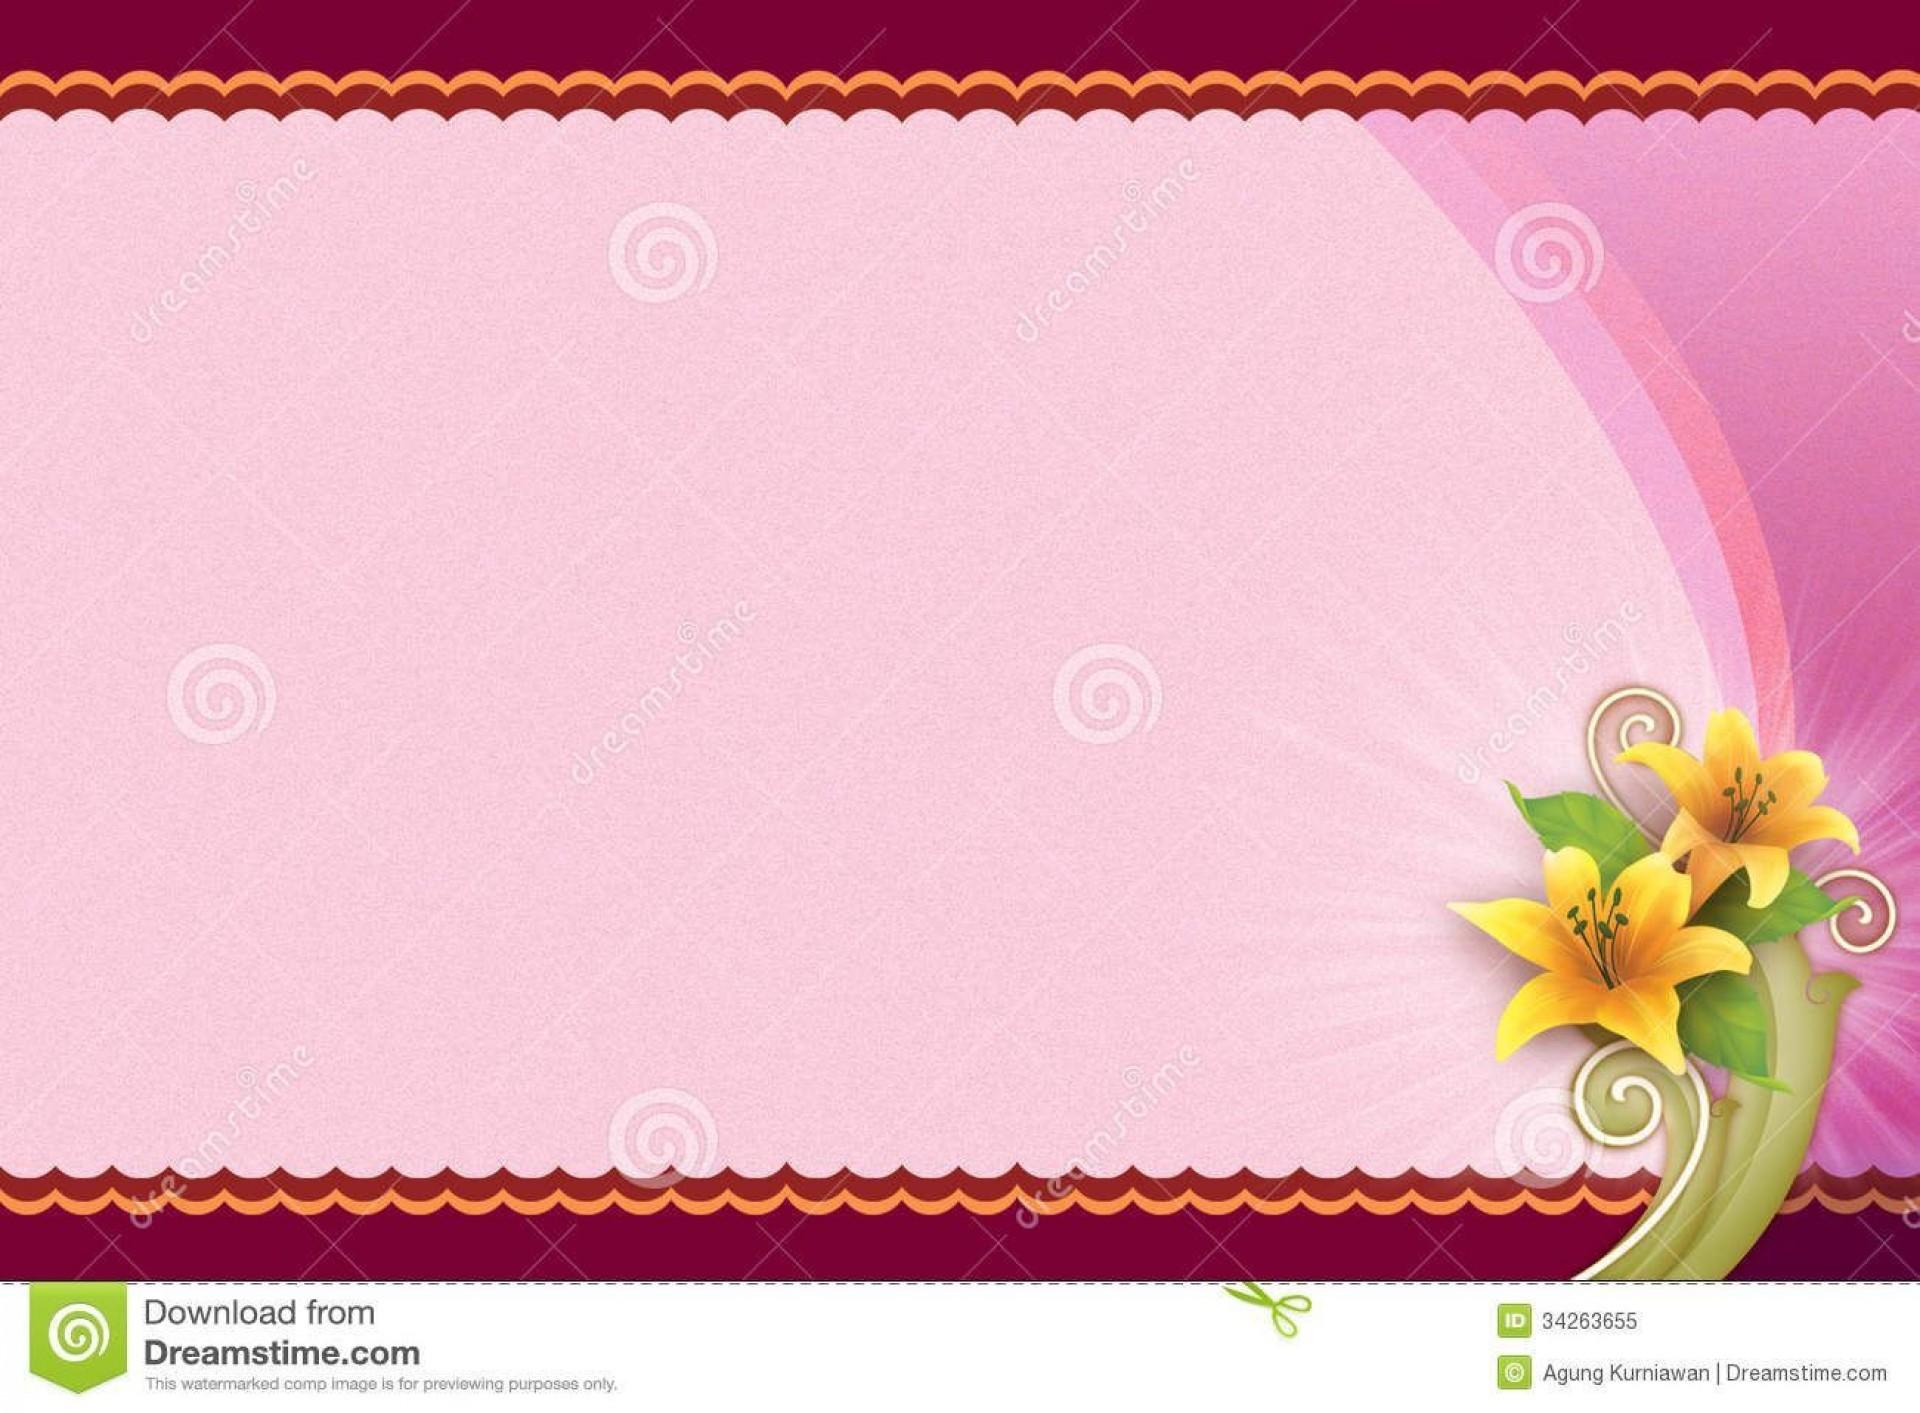 000 Fantastic Blank Birthday Card Template Idea  Word Free Printable Greeting Download1920